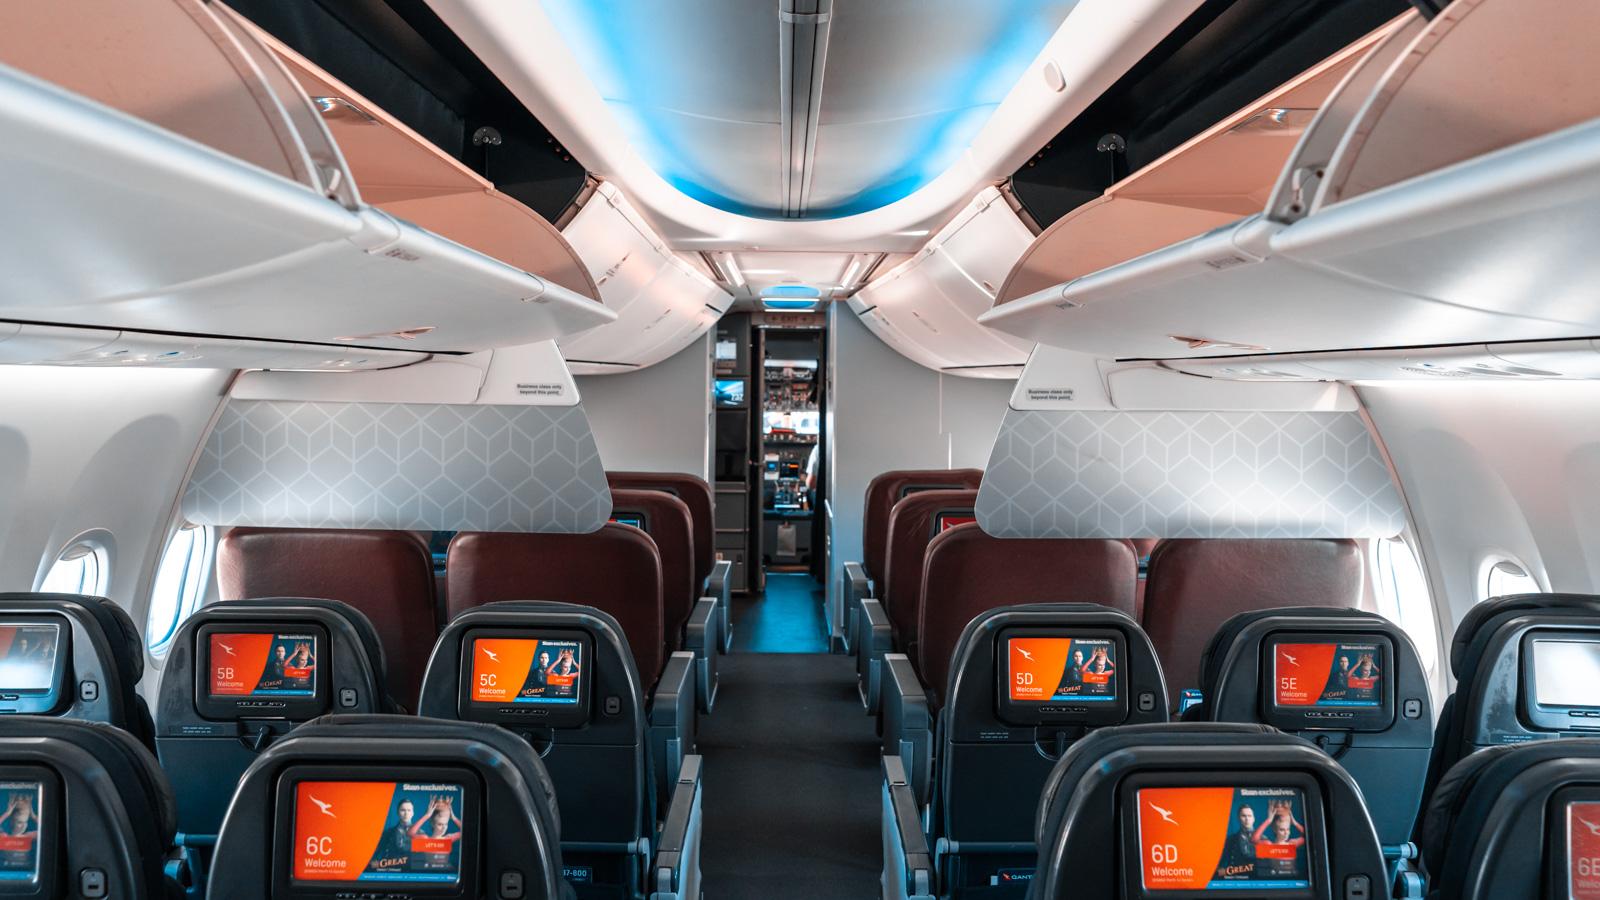 Qantas 737 Economy